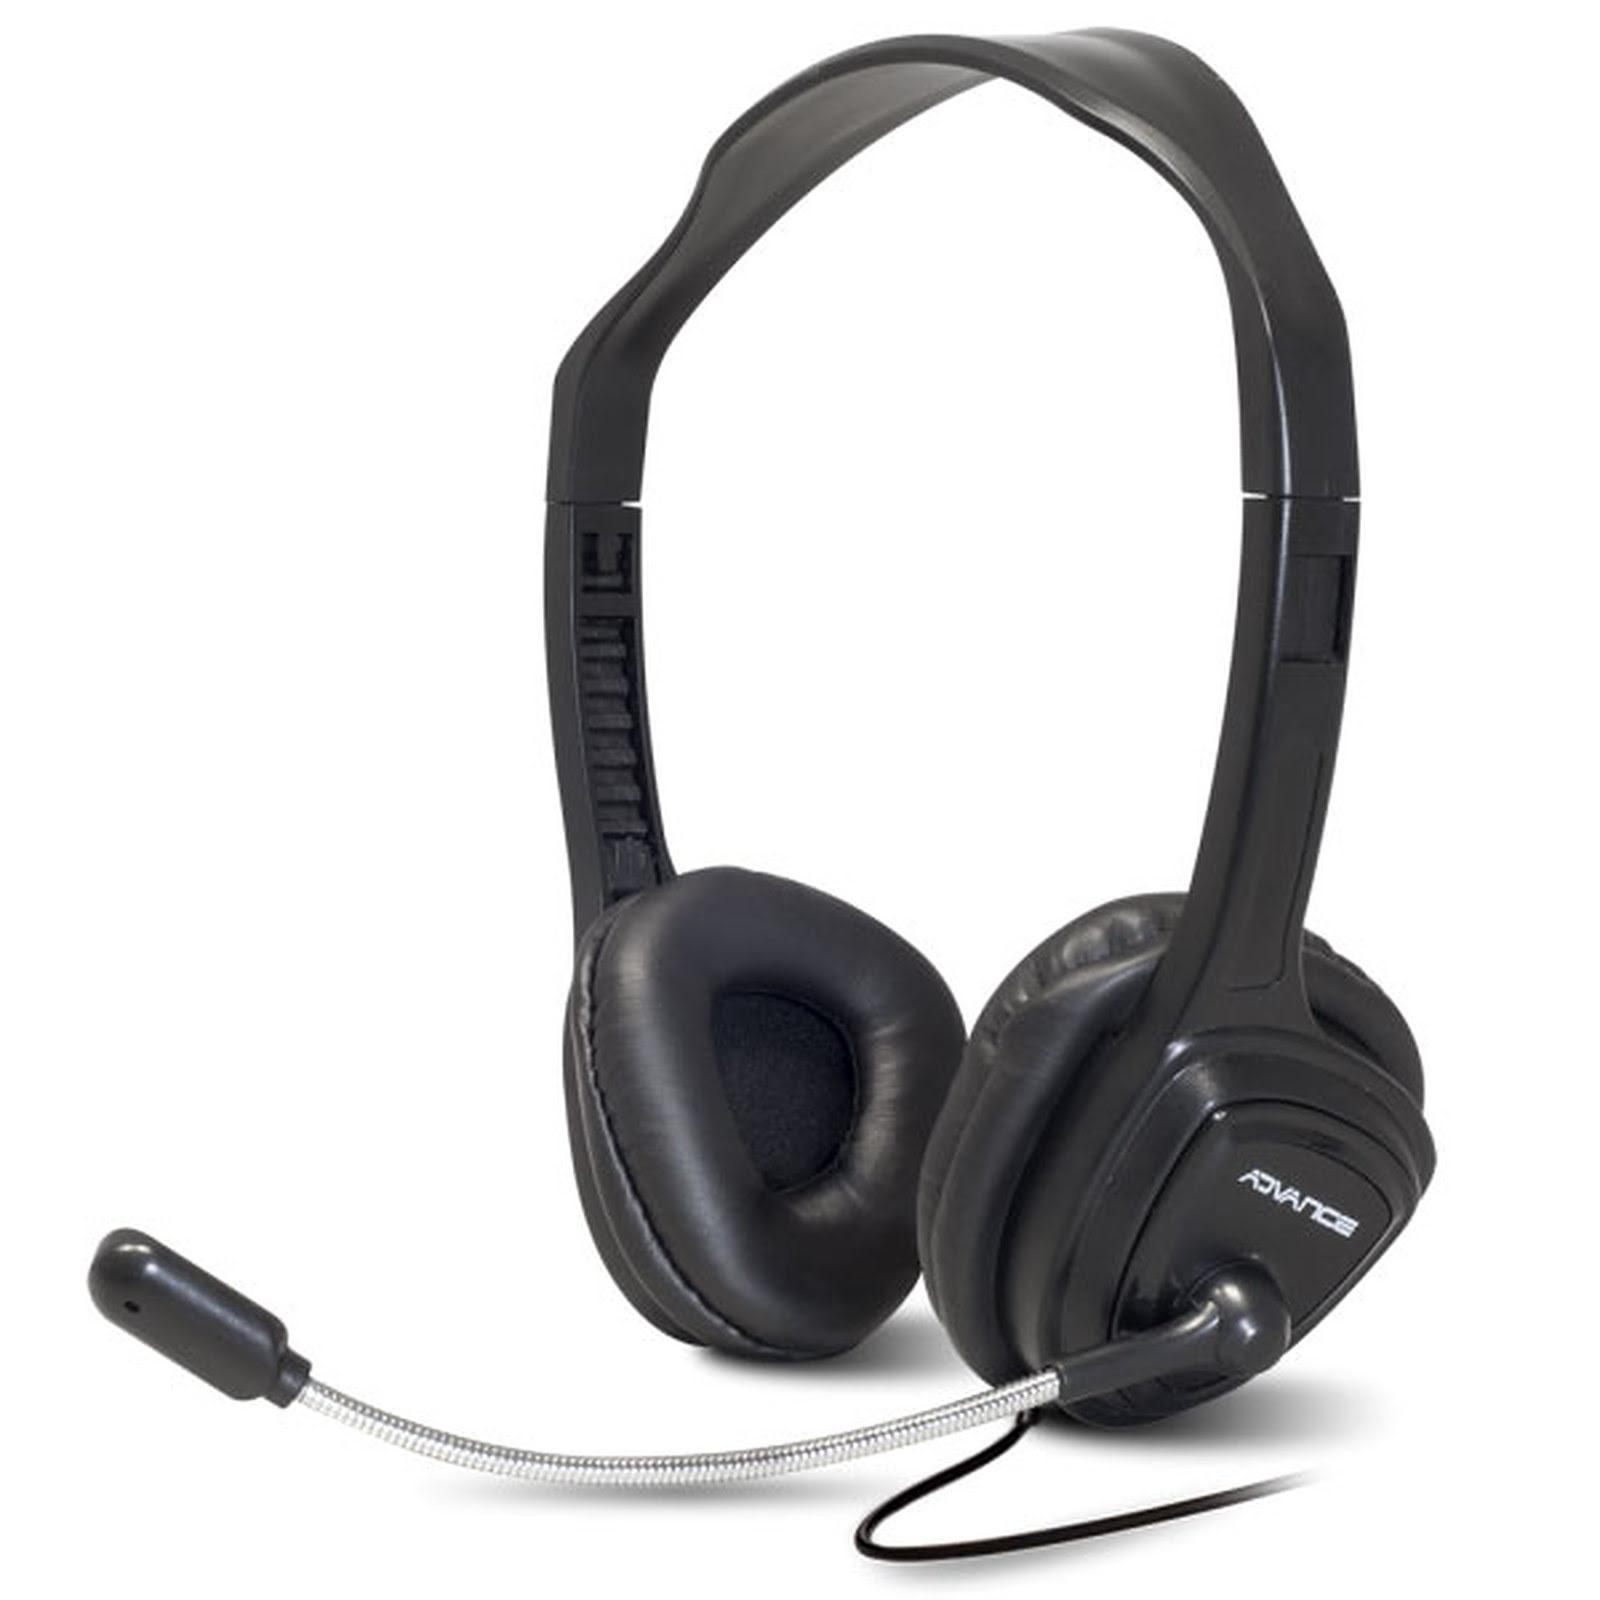 Advance Casque Multimédia Headphonics Smart Stereo - Micro-casque - 0